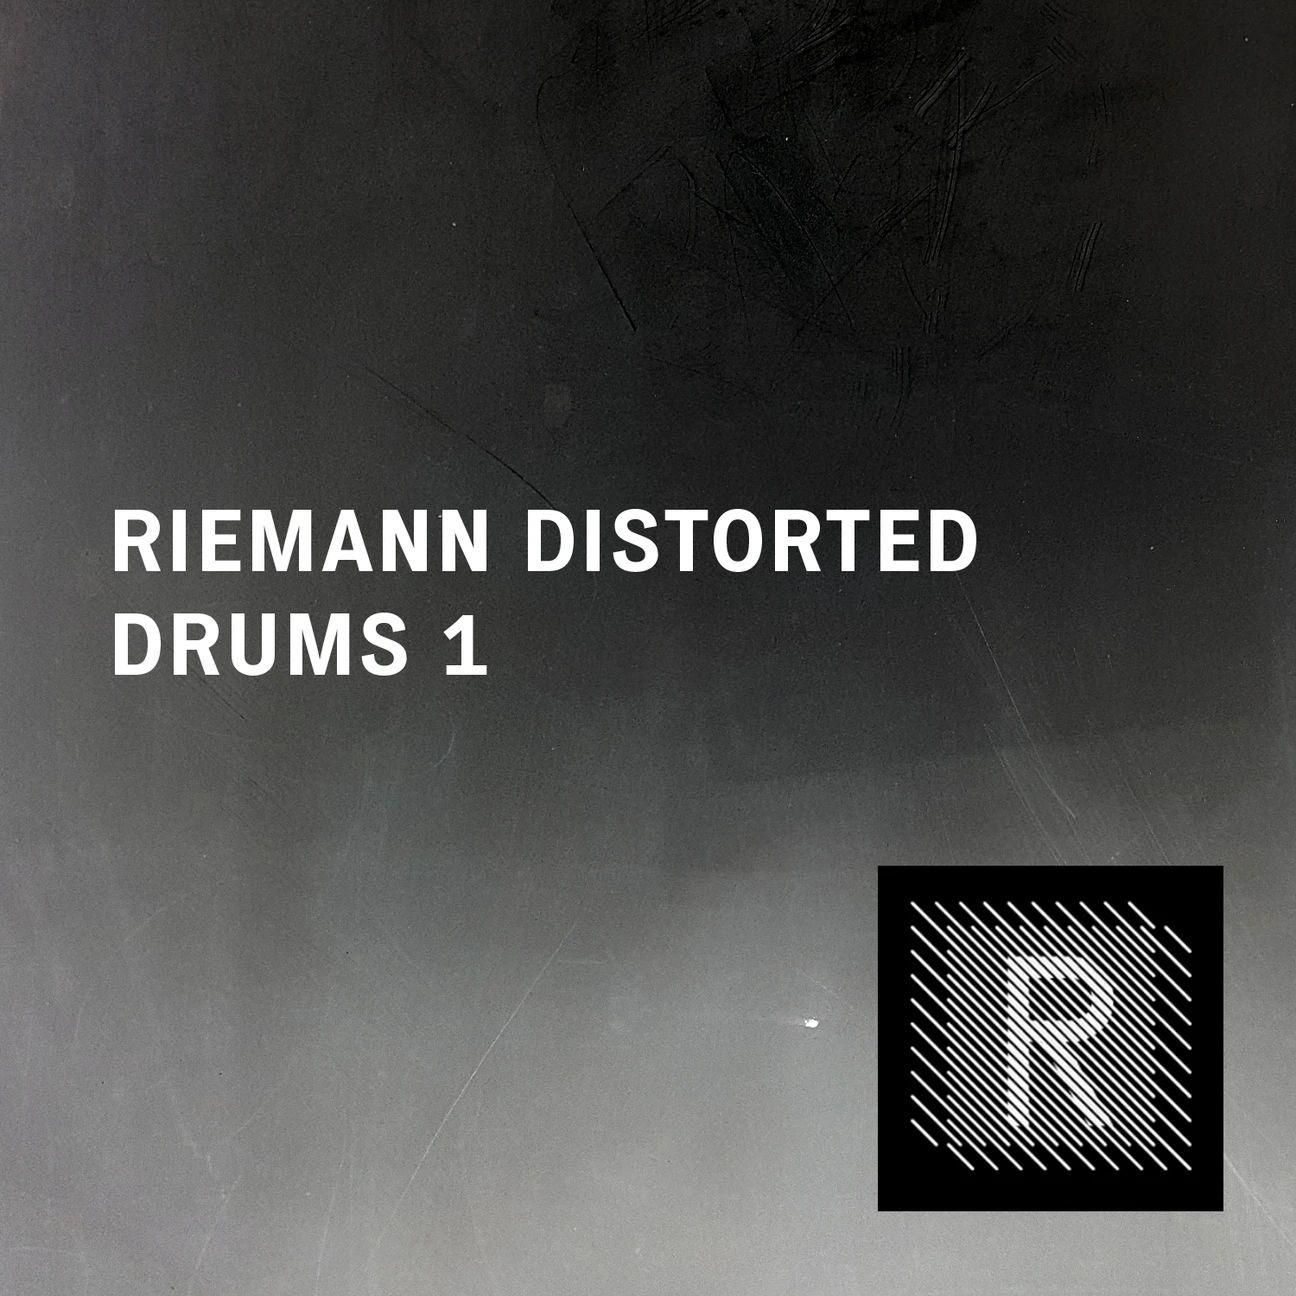 Riemann Distorted Drums 1 Samplepack kostenlos